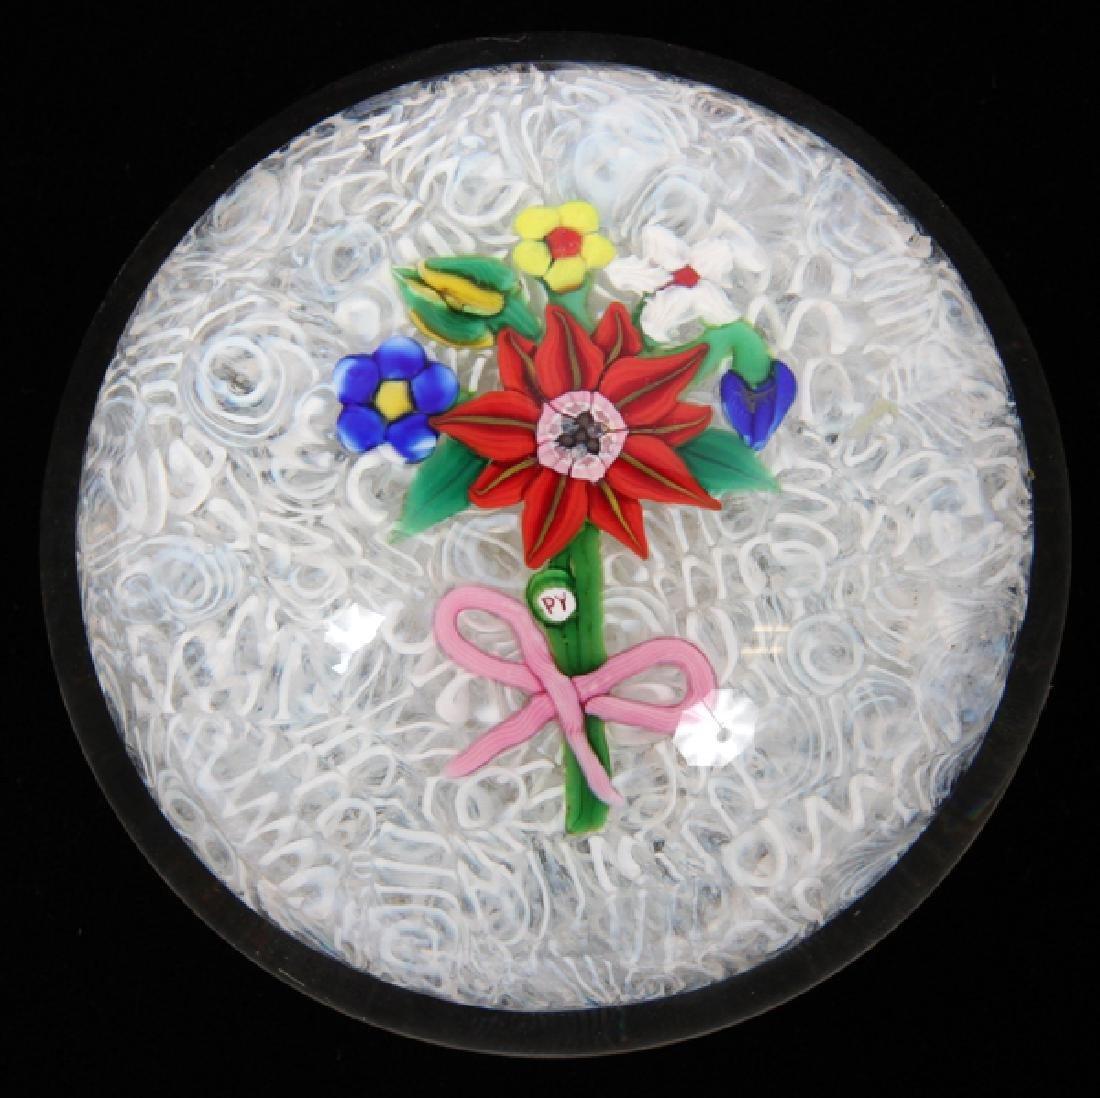 PAUL YSART ART GLASS PAPERWEIGHT LATE 20TH C. - 2